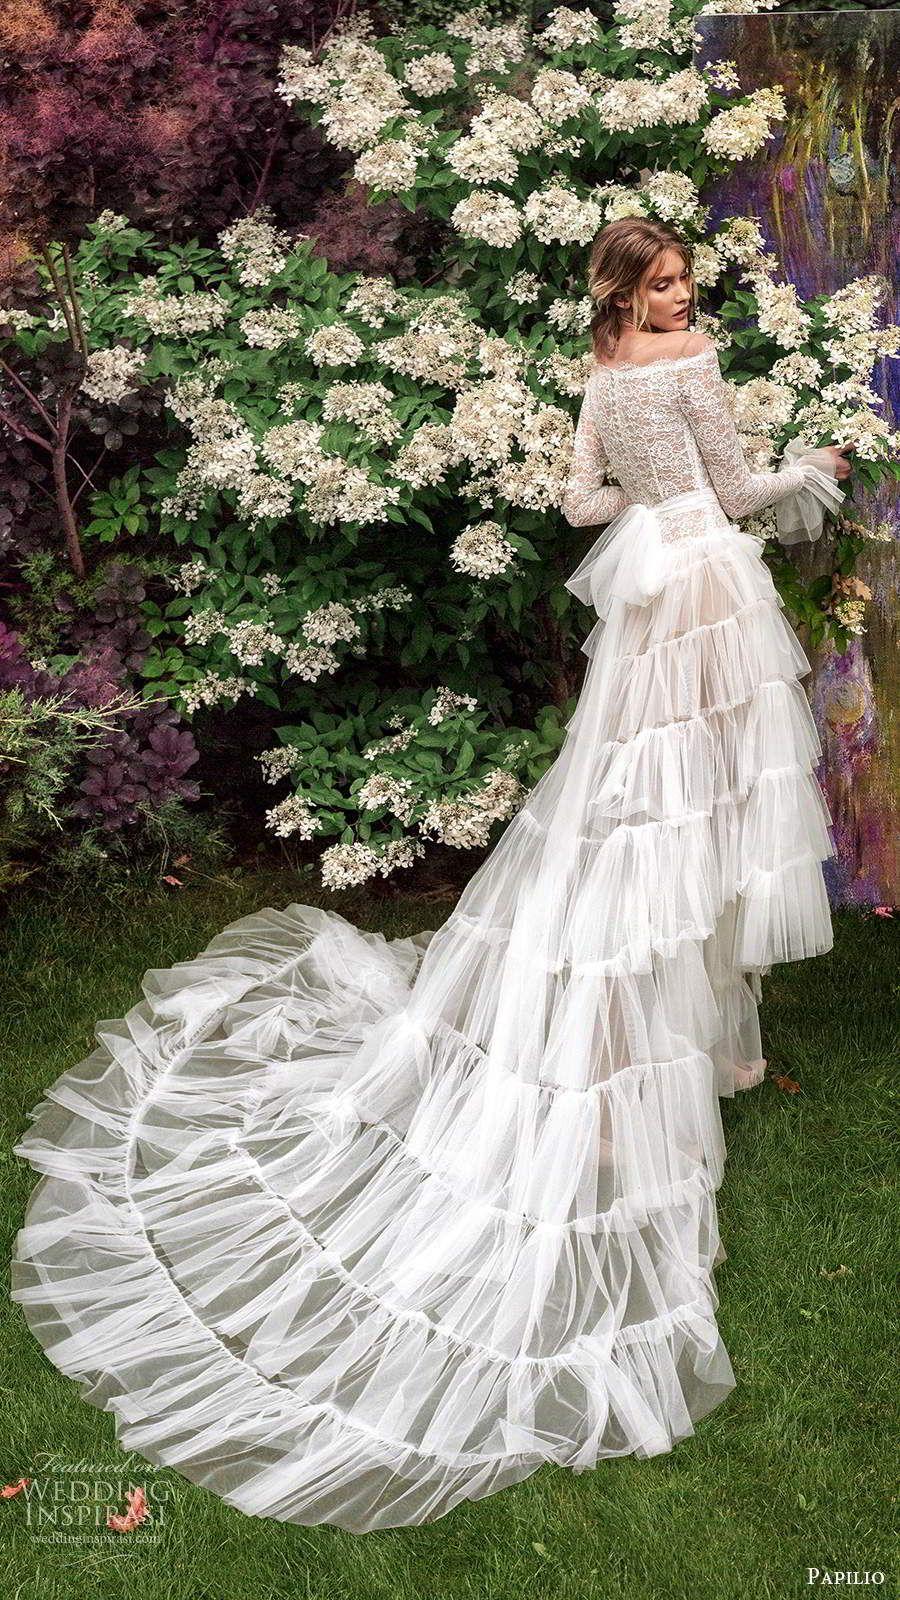 Papilio 2020 Wedding Dresses Impression Bridal Collection Part 1 Wedding Inspirasi Winter Wedding Guest Dress Winter Wedding Dress Wedding Guest Outfit Winter [ 1600 x 900 Pixel ]